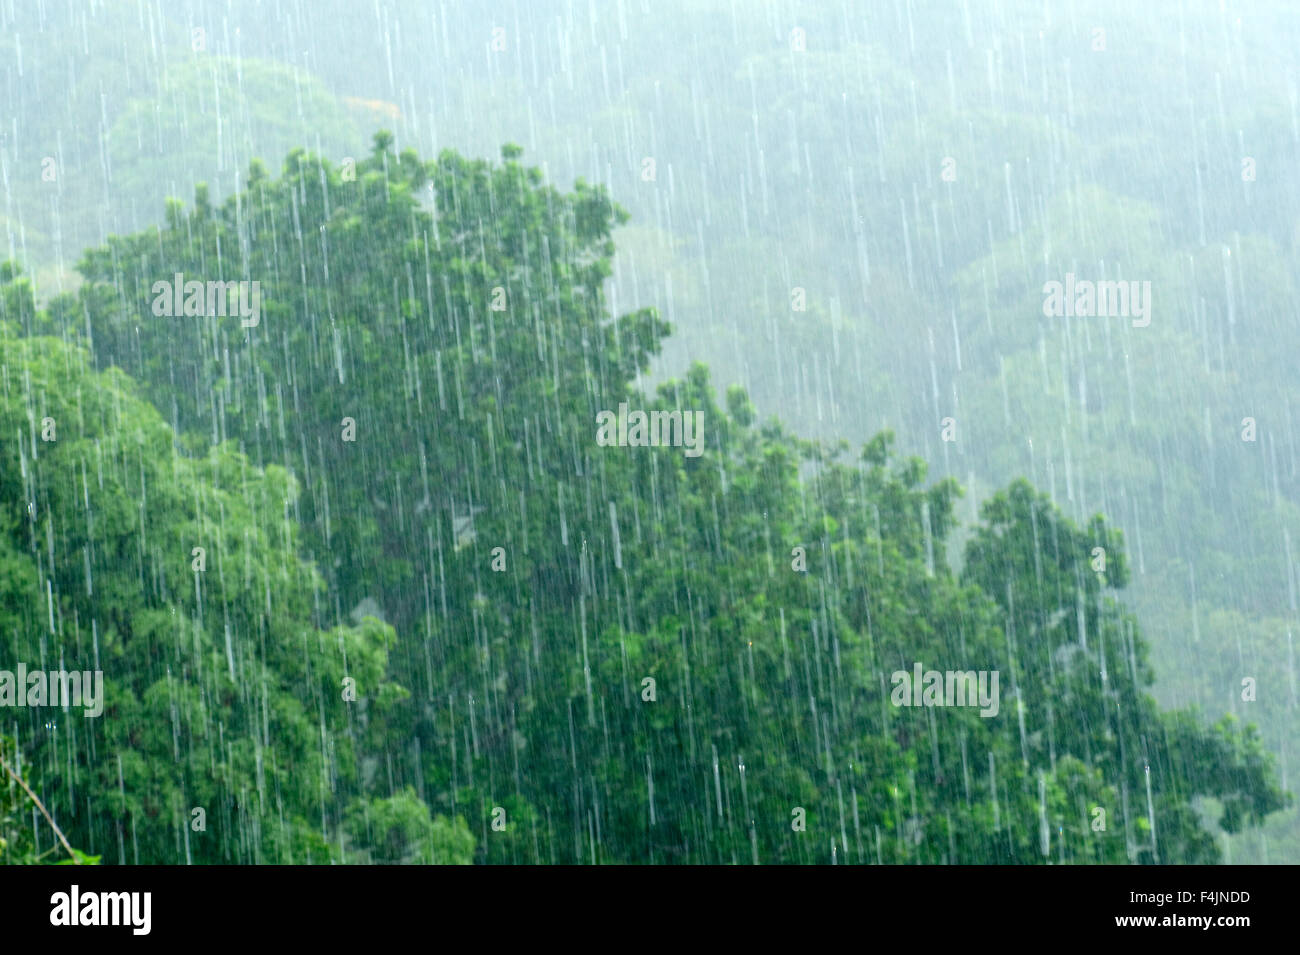 Heavy Rainfall jungle Panama - Stock Image